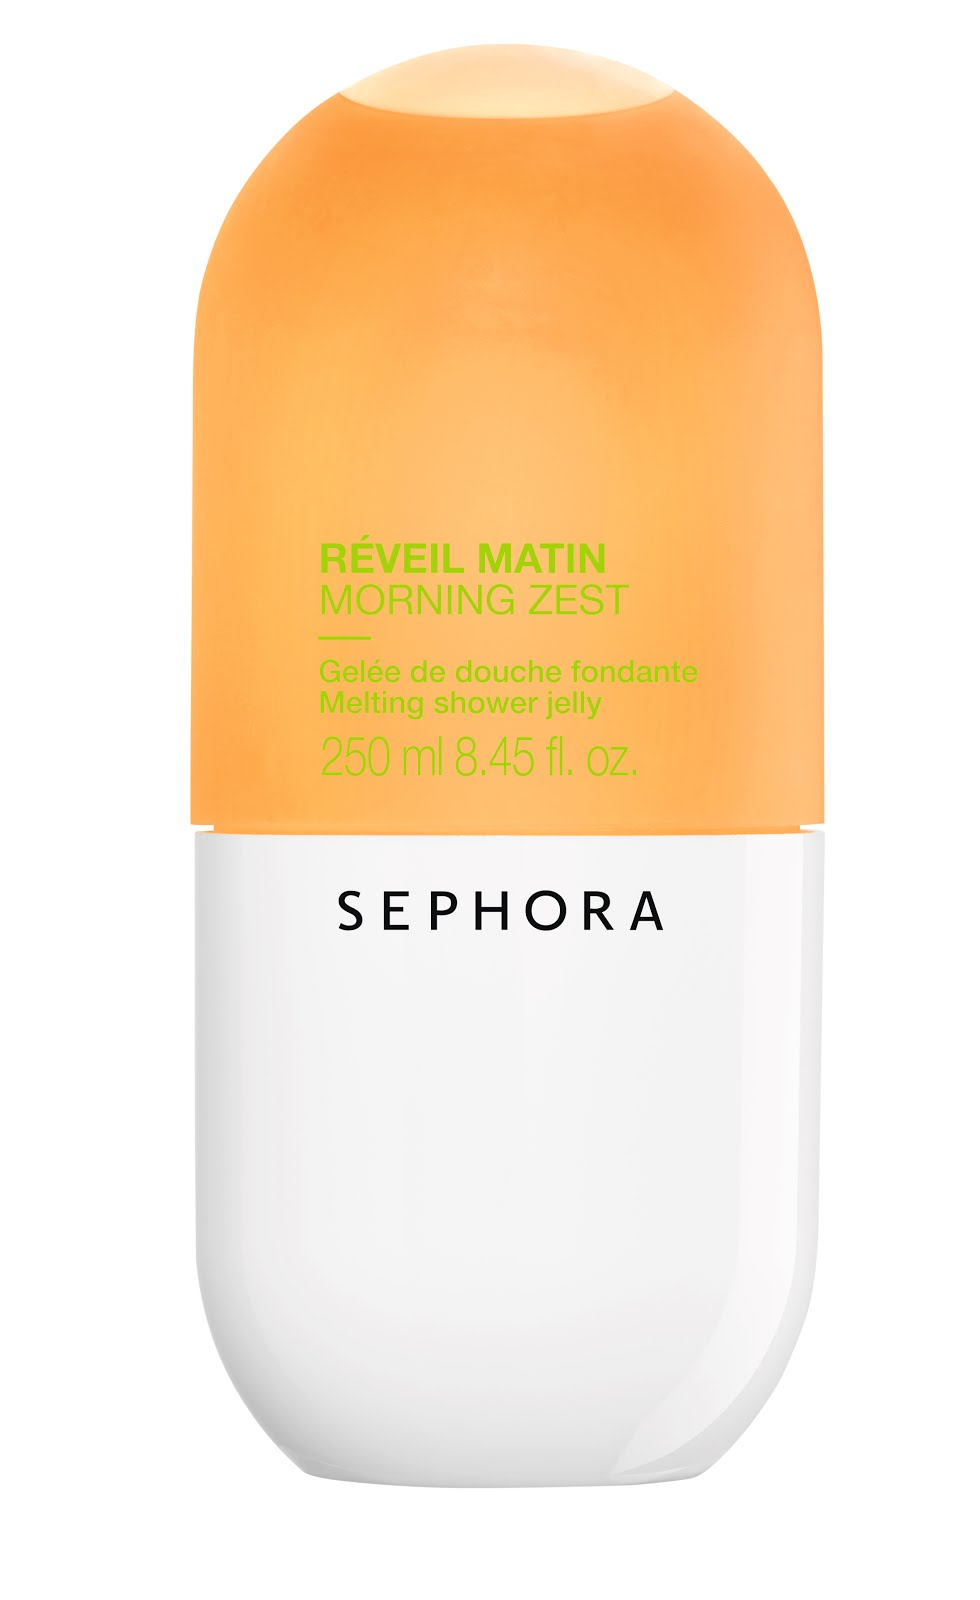 Sephora Vasca Da Bagno.Letizia Maestri Make Up More Sephora Bath Collection Kk18